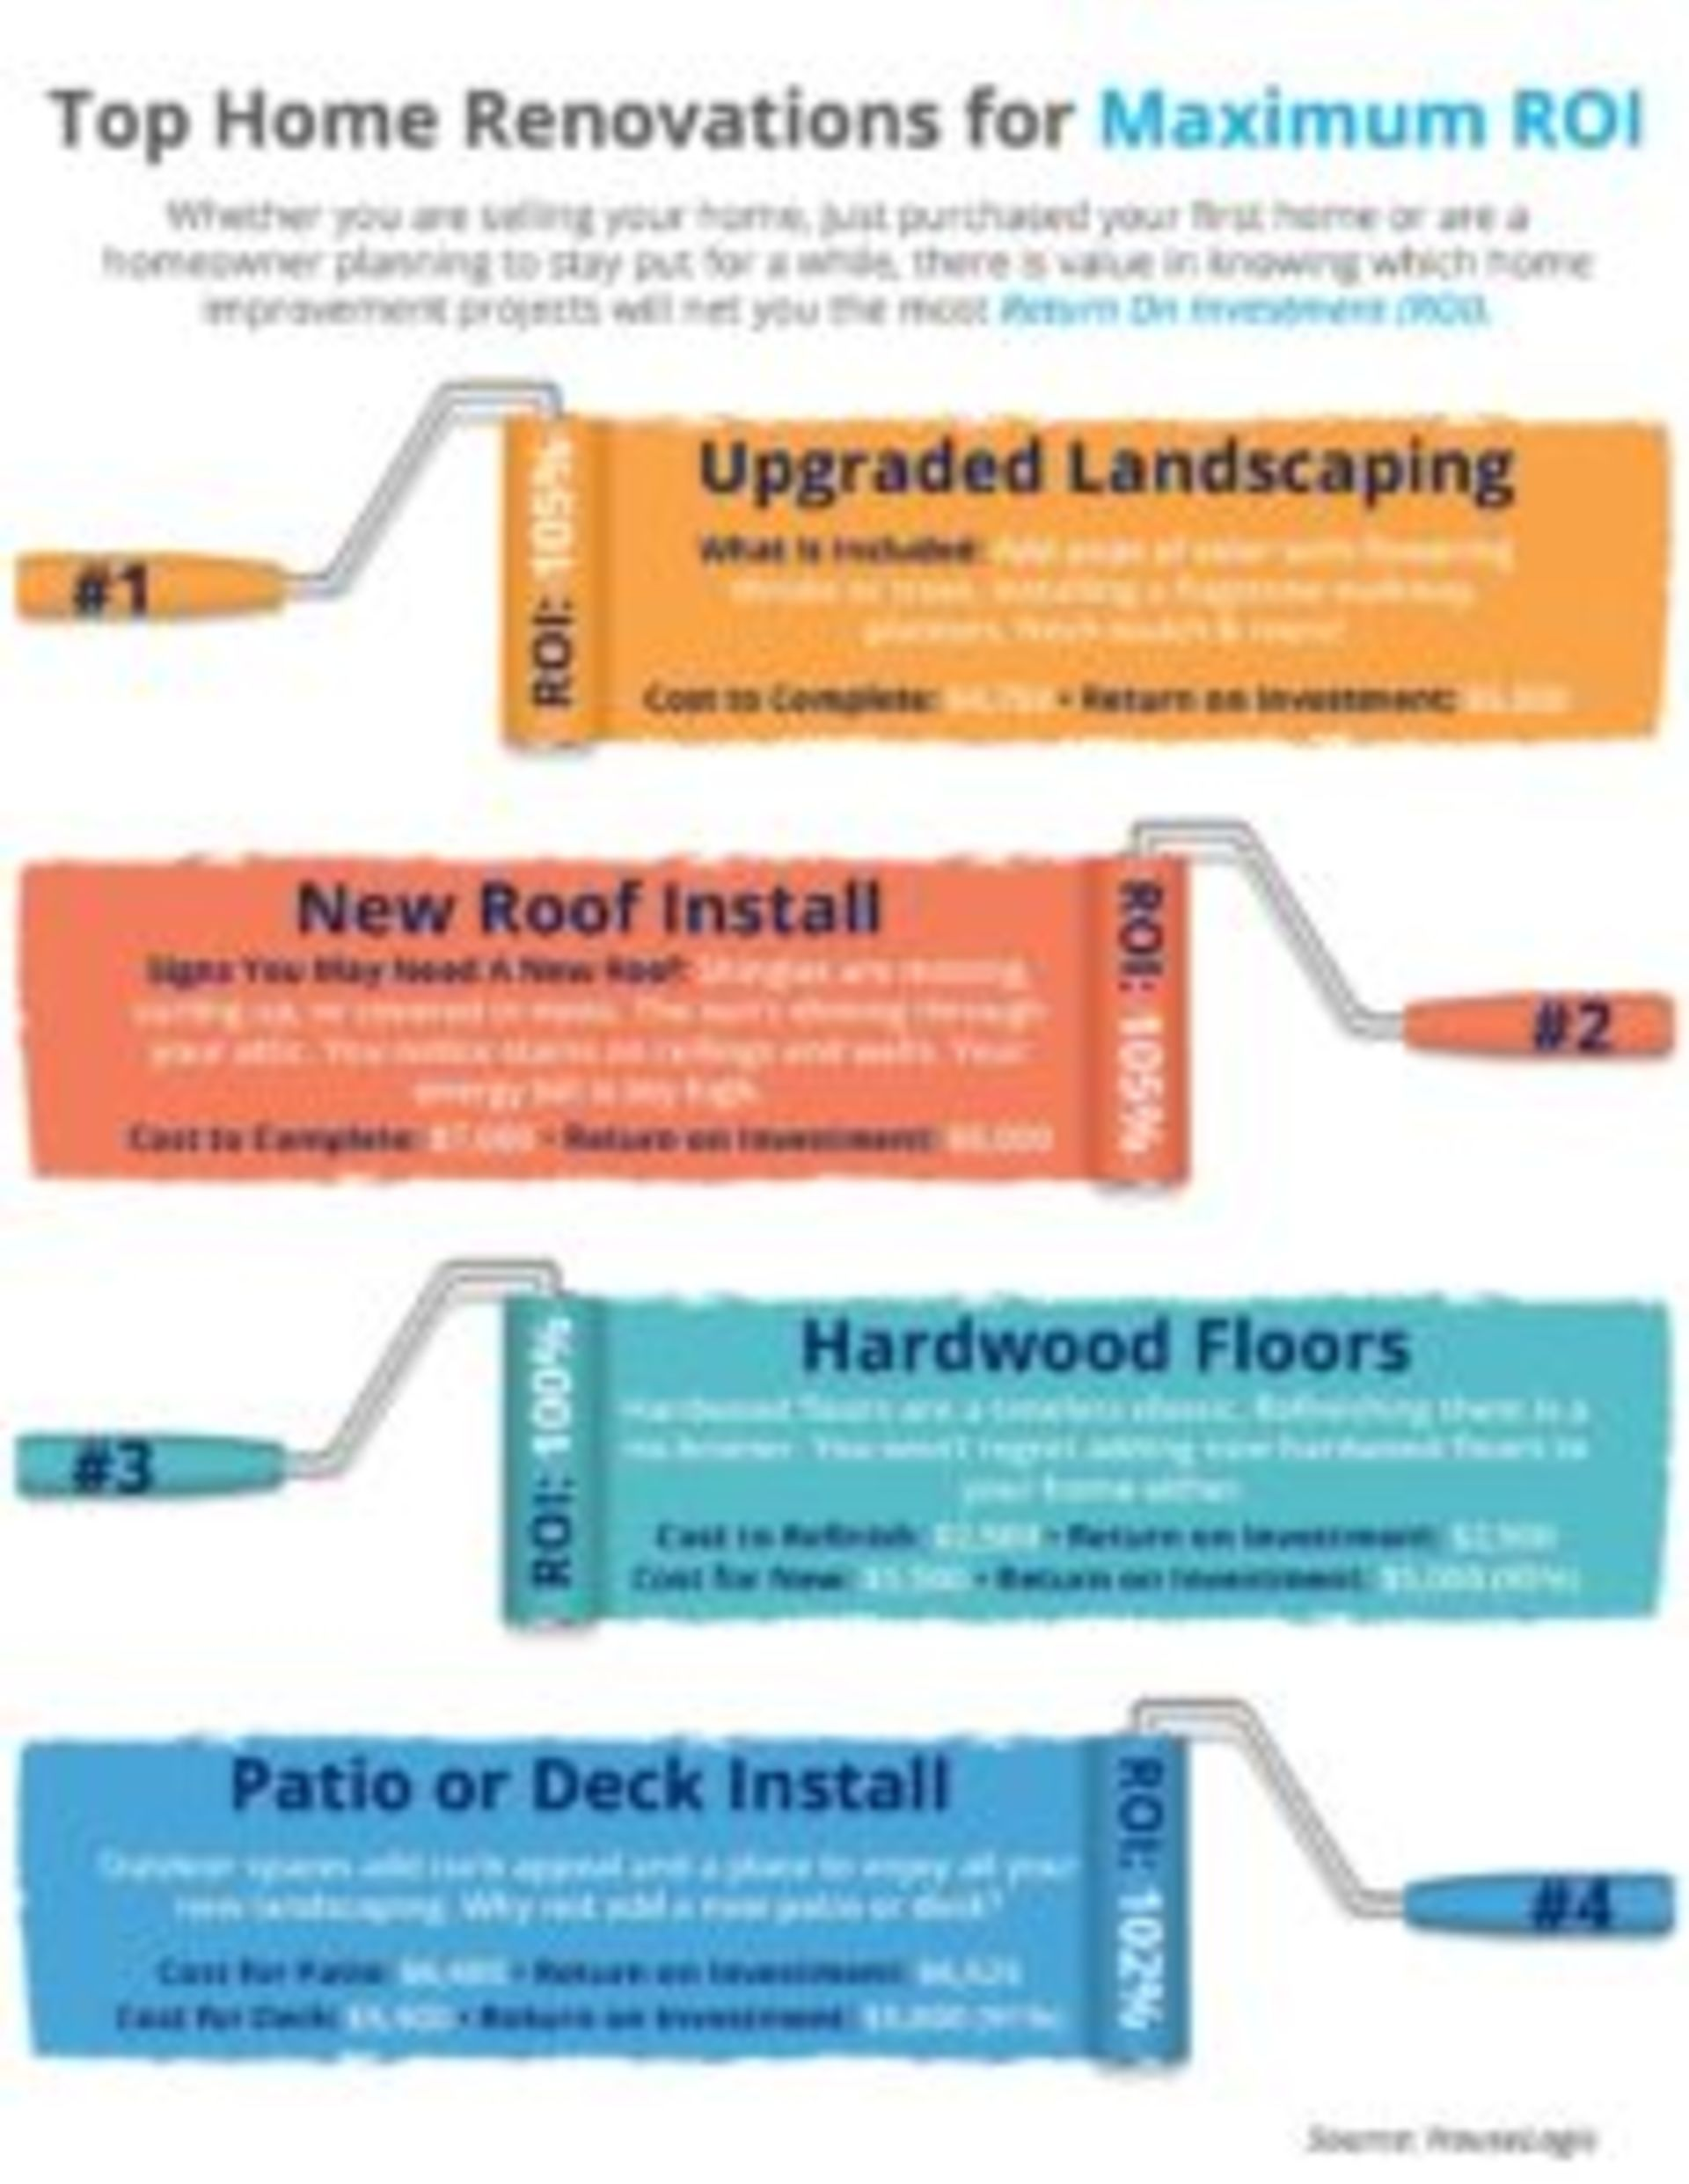 Top Home Renovations for Maximum ROI